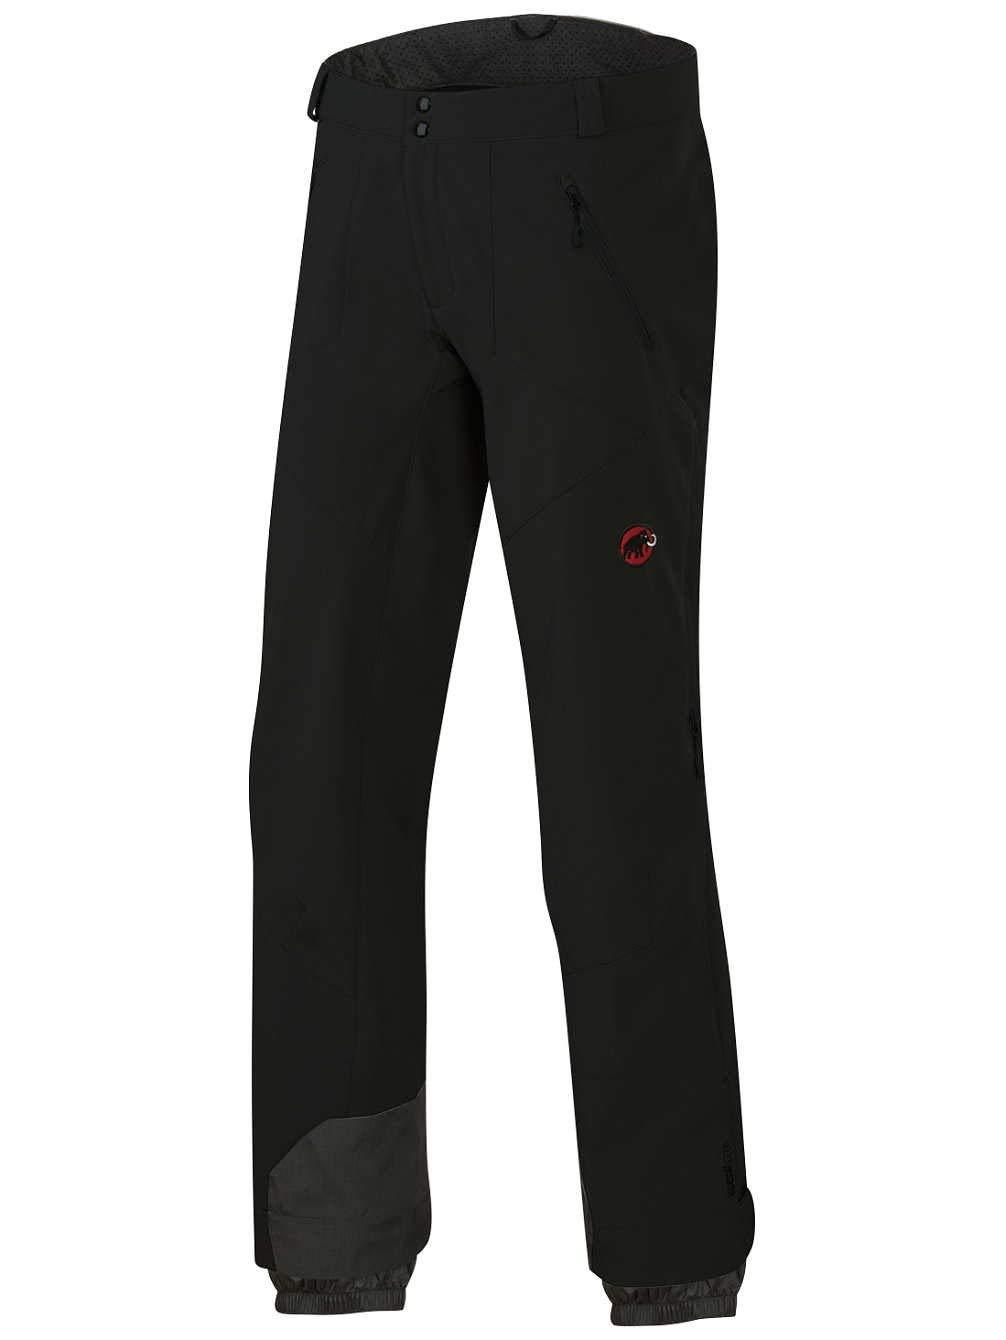 Mammut Herren Snowboard Hose Tatramar So Pants